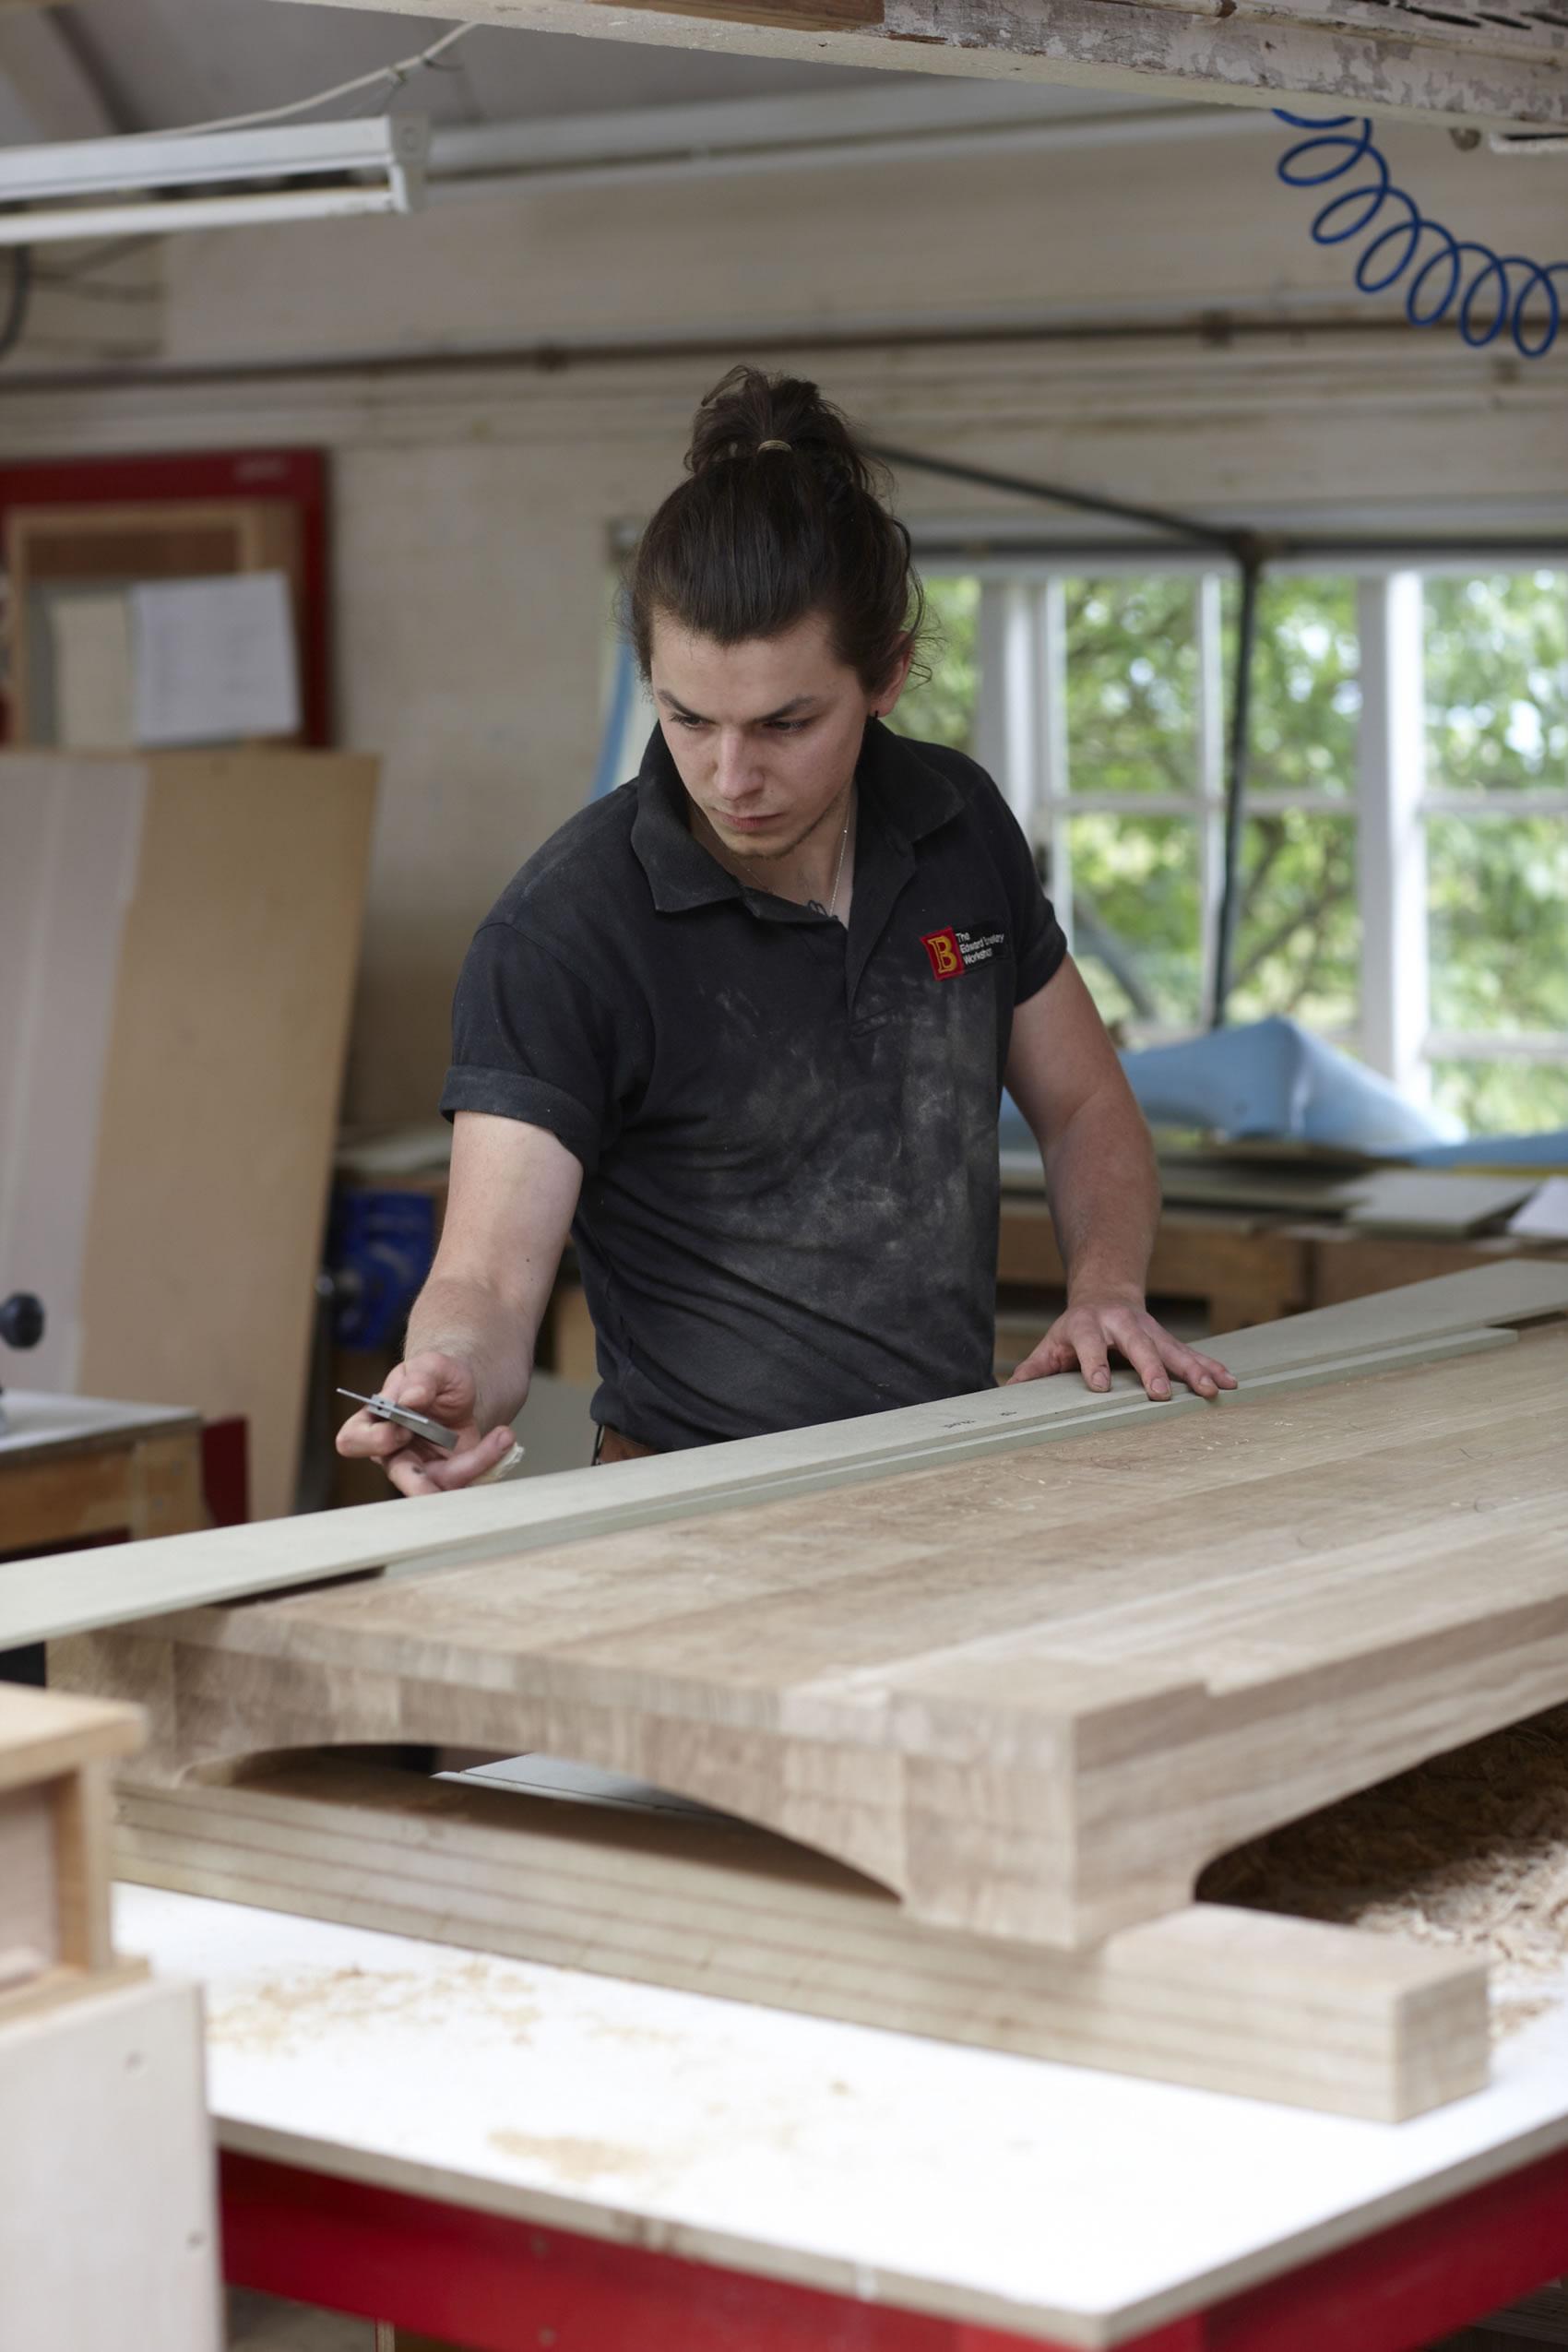 Furniture making apprenticeship with edward barnsley workshop for Furniture making courses